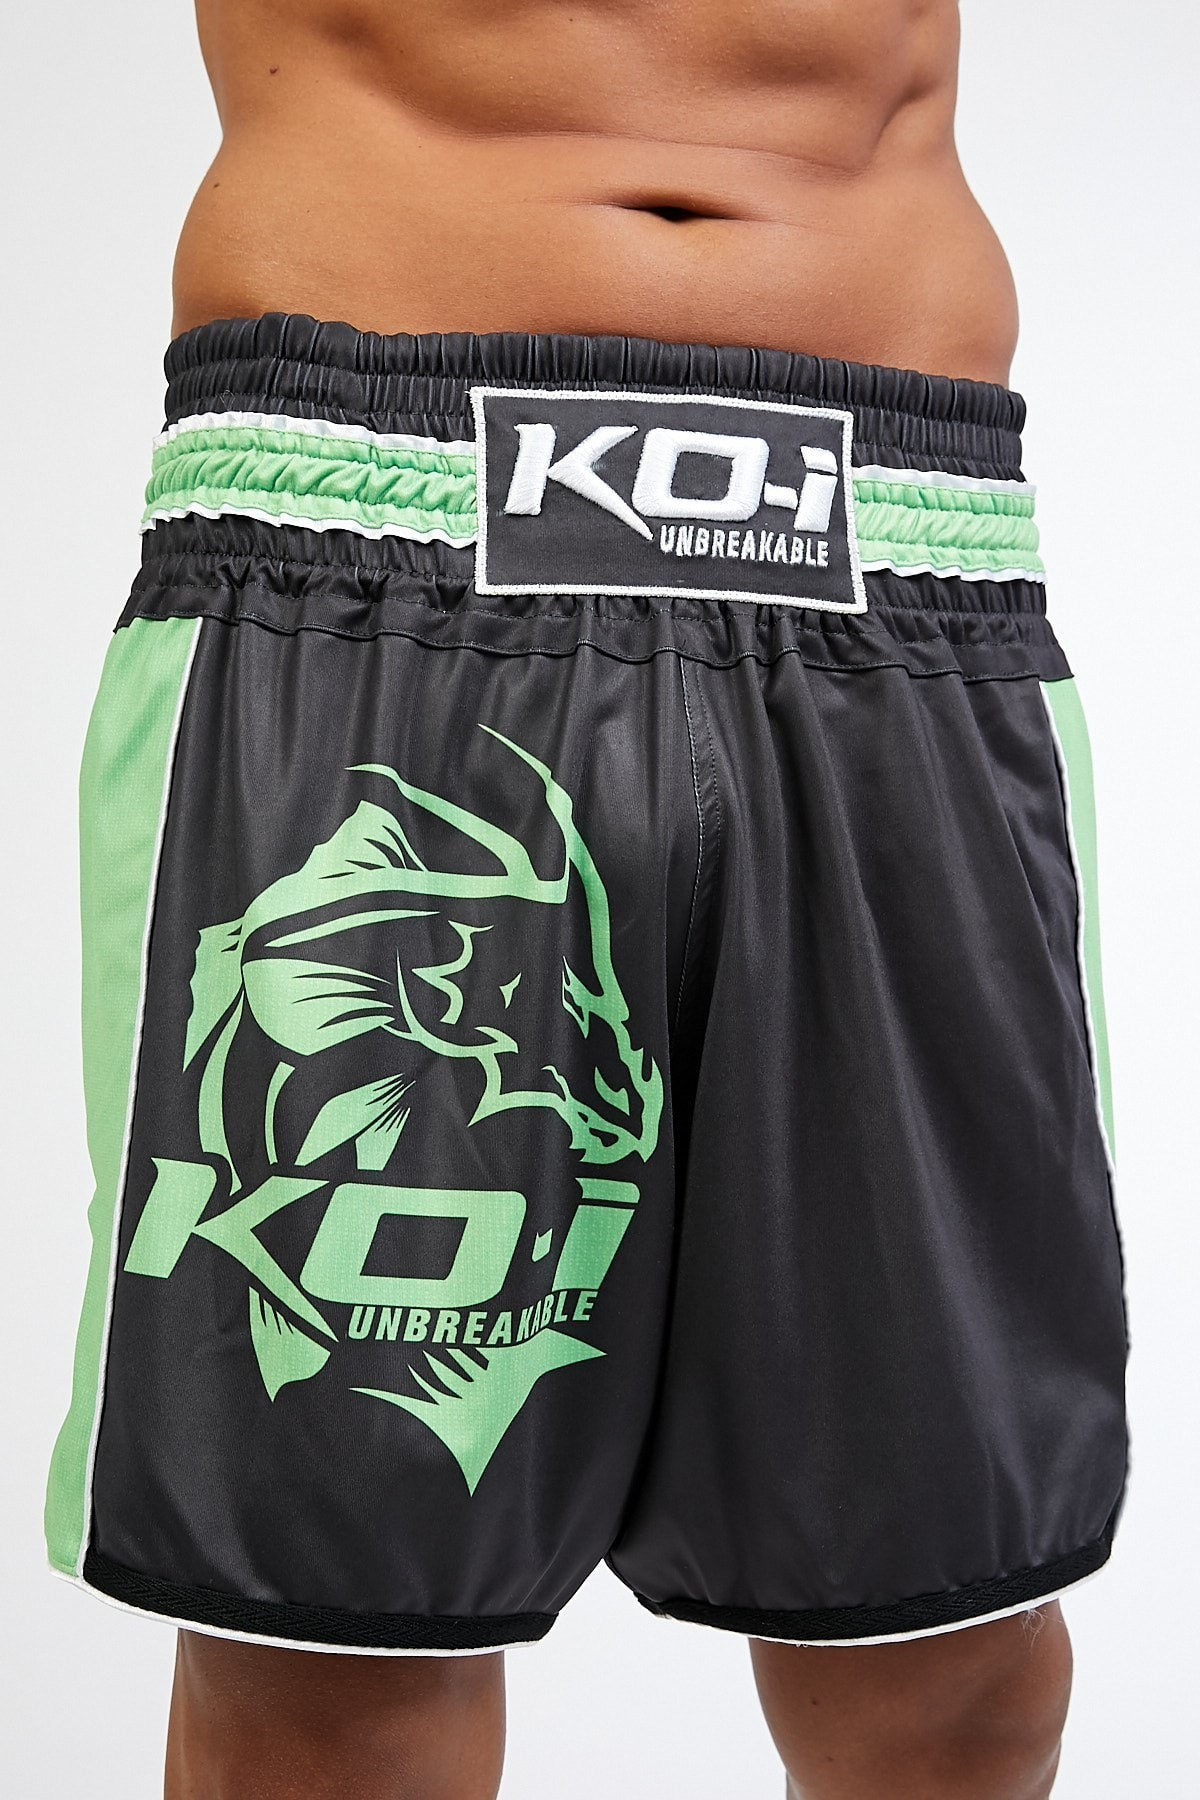 KO-I FIGHT Ko-ı Neon Logo Traınıng Short, Antreman Şortu 1